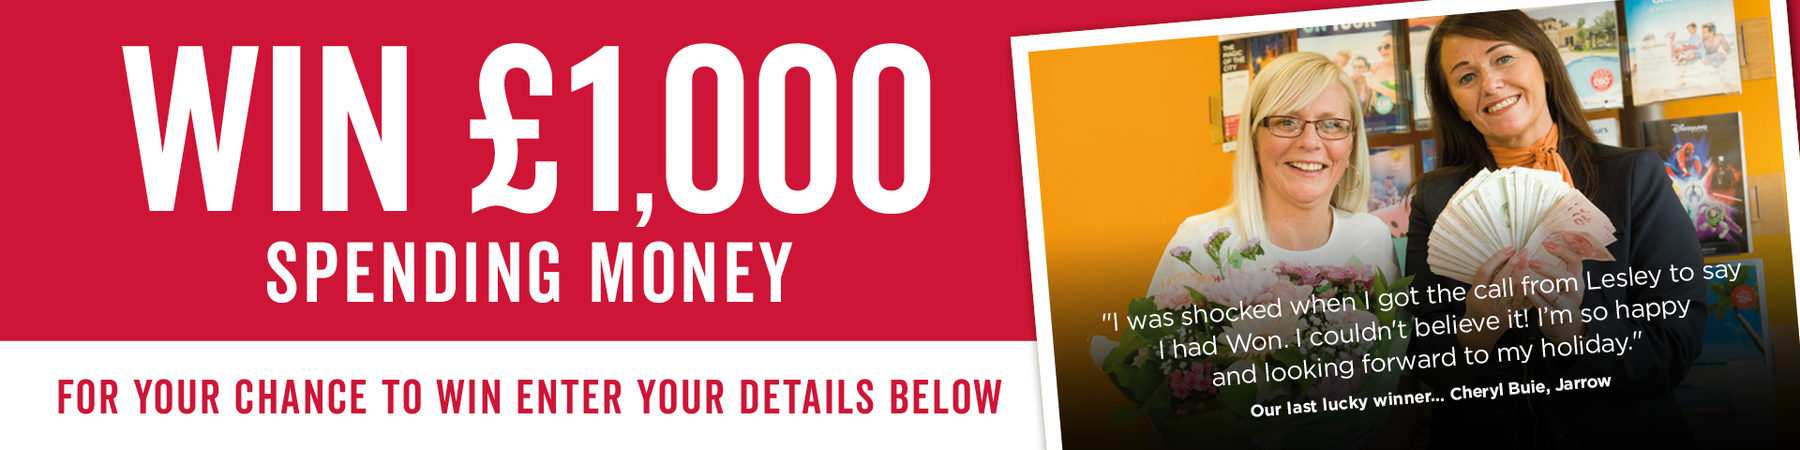 Win £1000 Spending Money